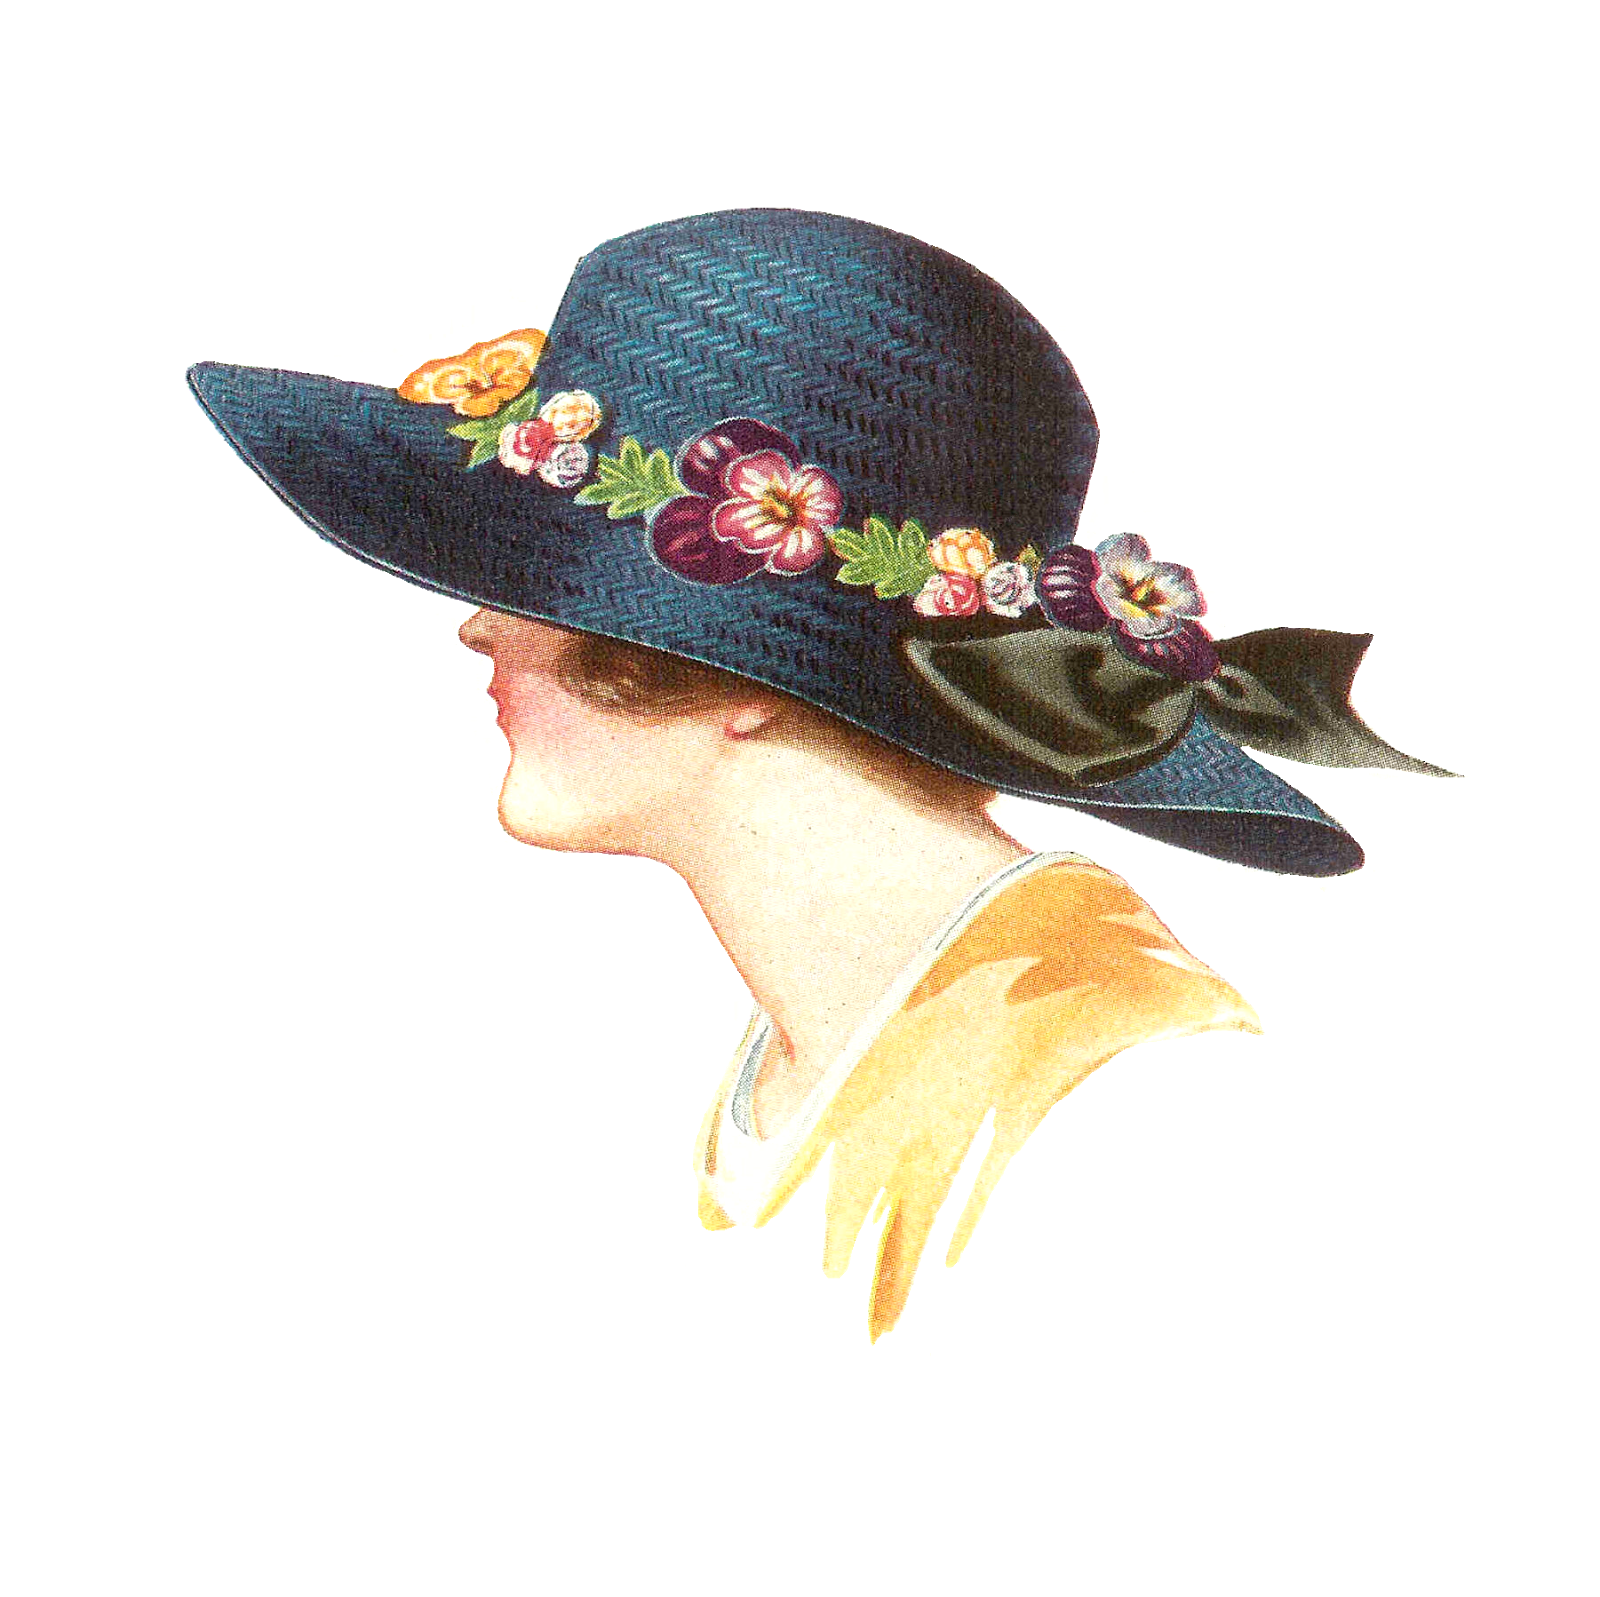 Antique Images: Free Hat Fashion Clip Art: 1915 Women's Spring Hat.